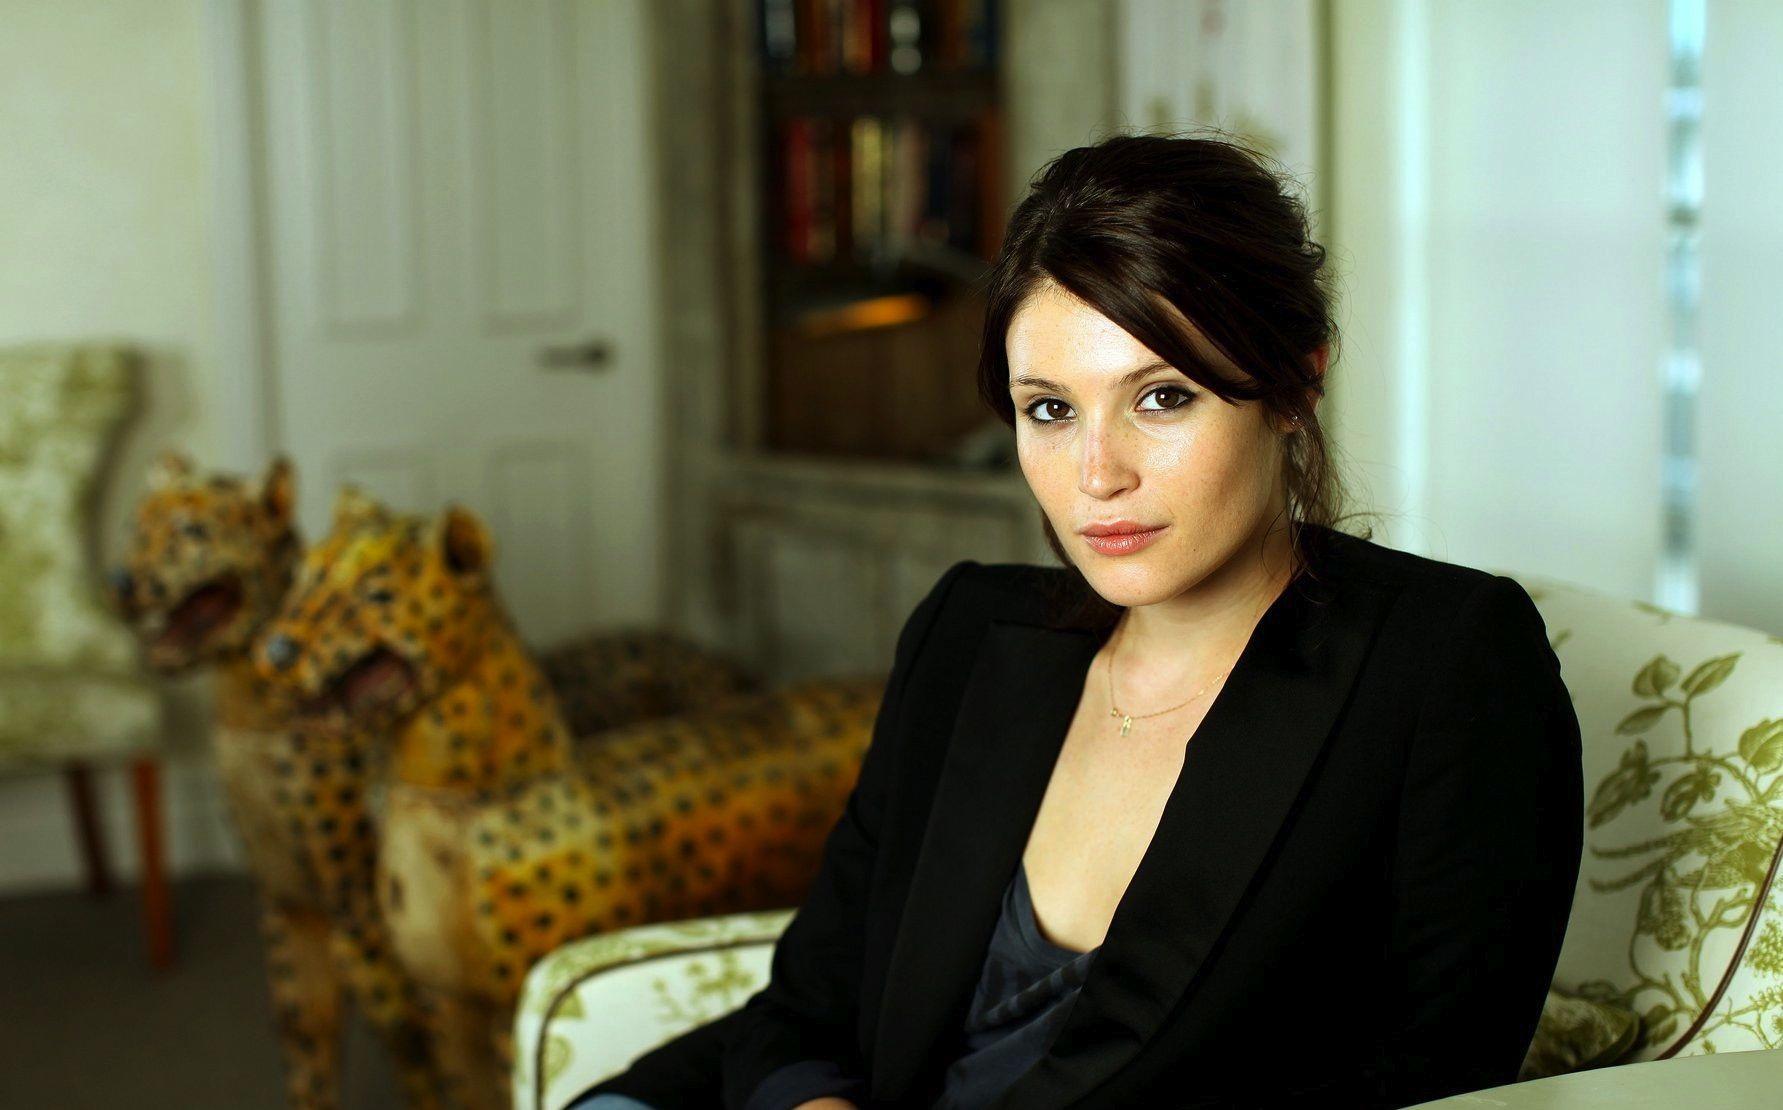 Fall Down Wallpaper Gemma Arterton Olivia Thirlby And Harry Treadaway Up For